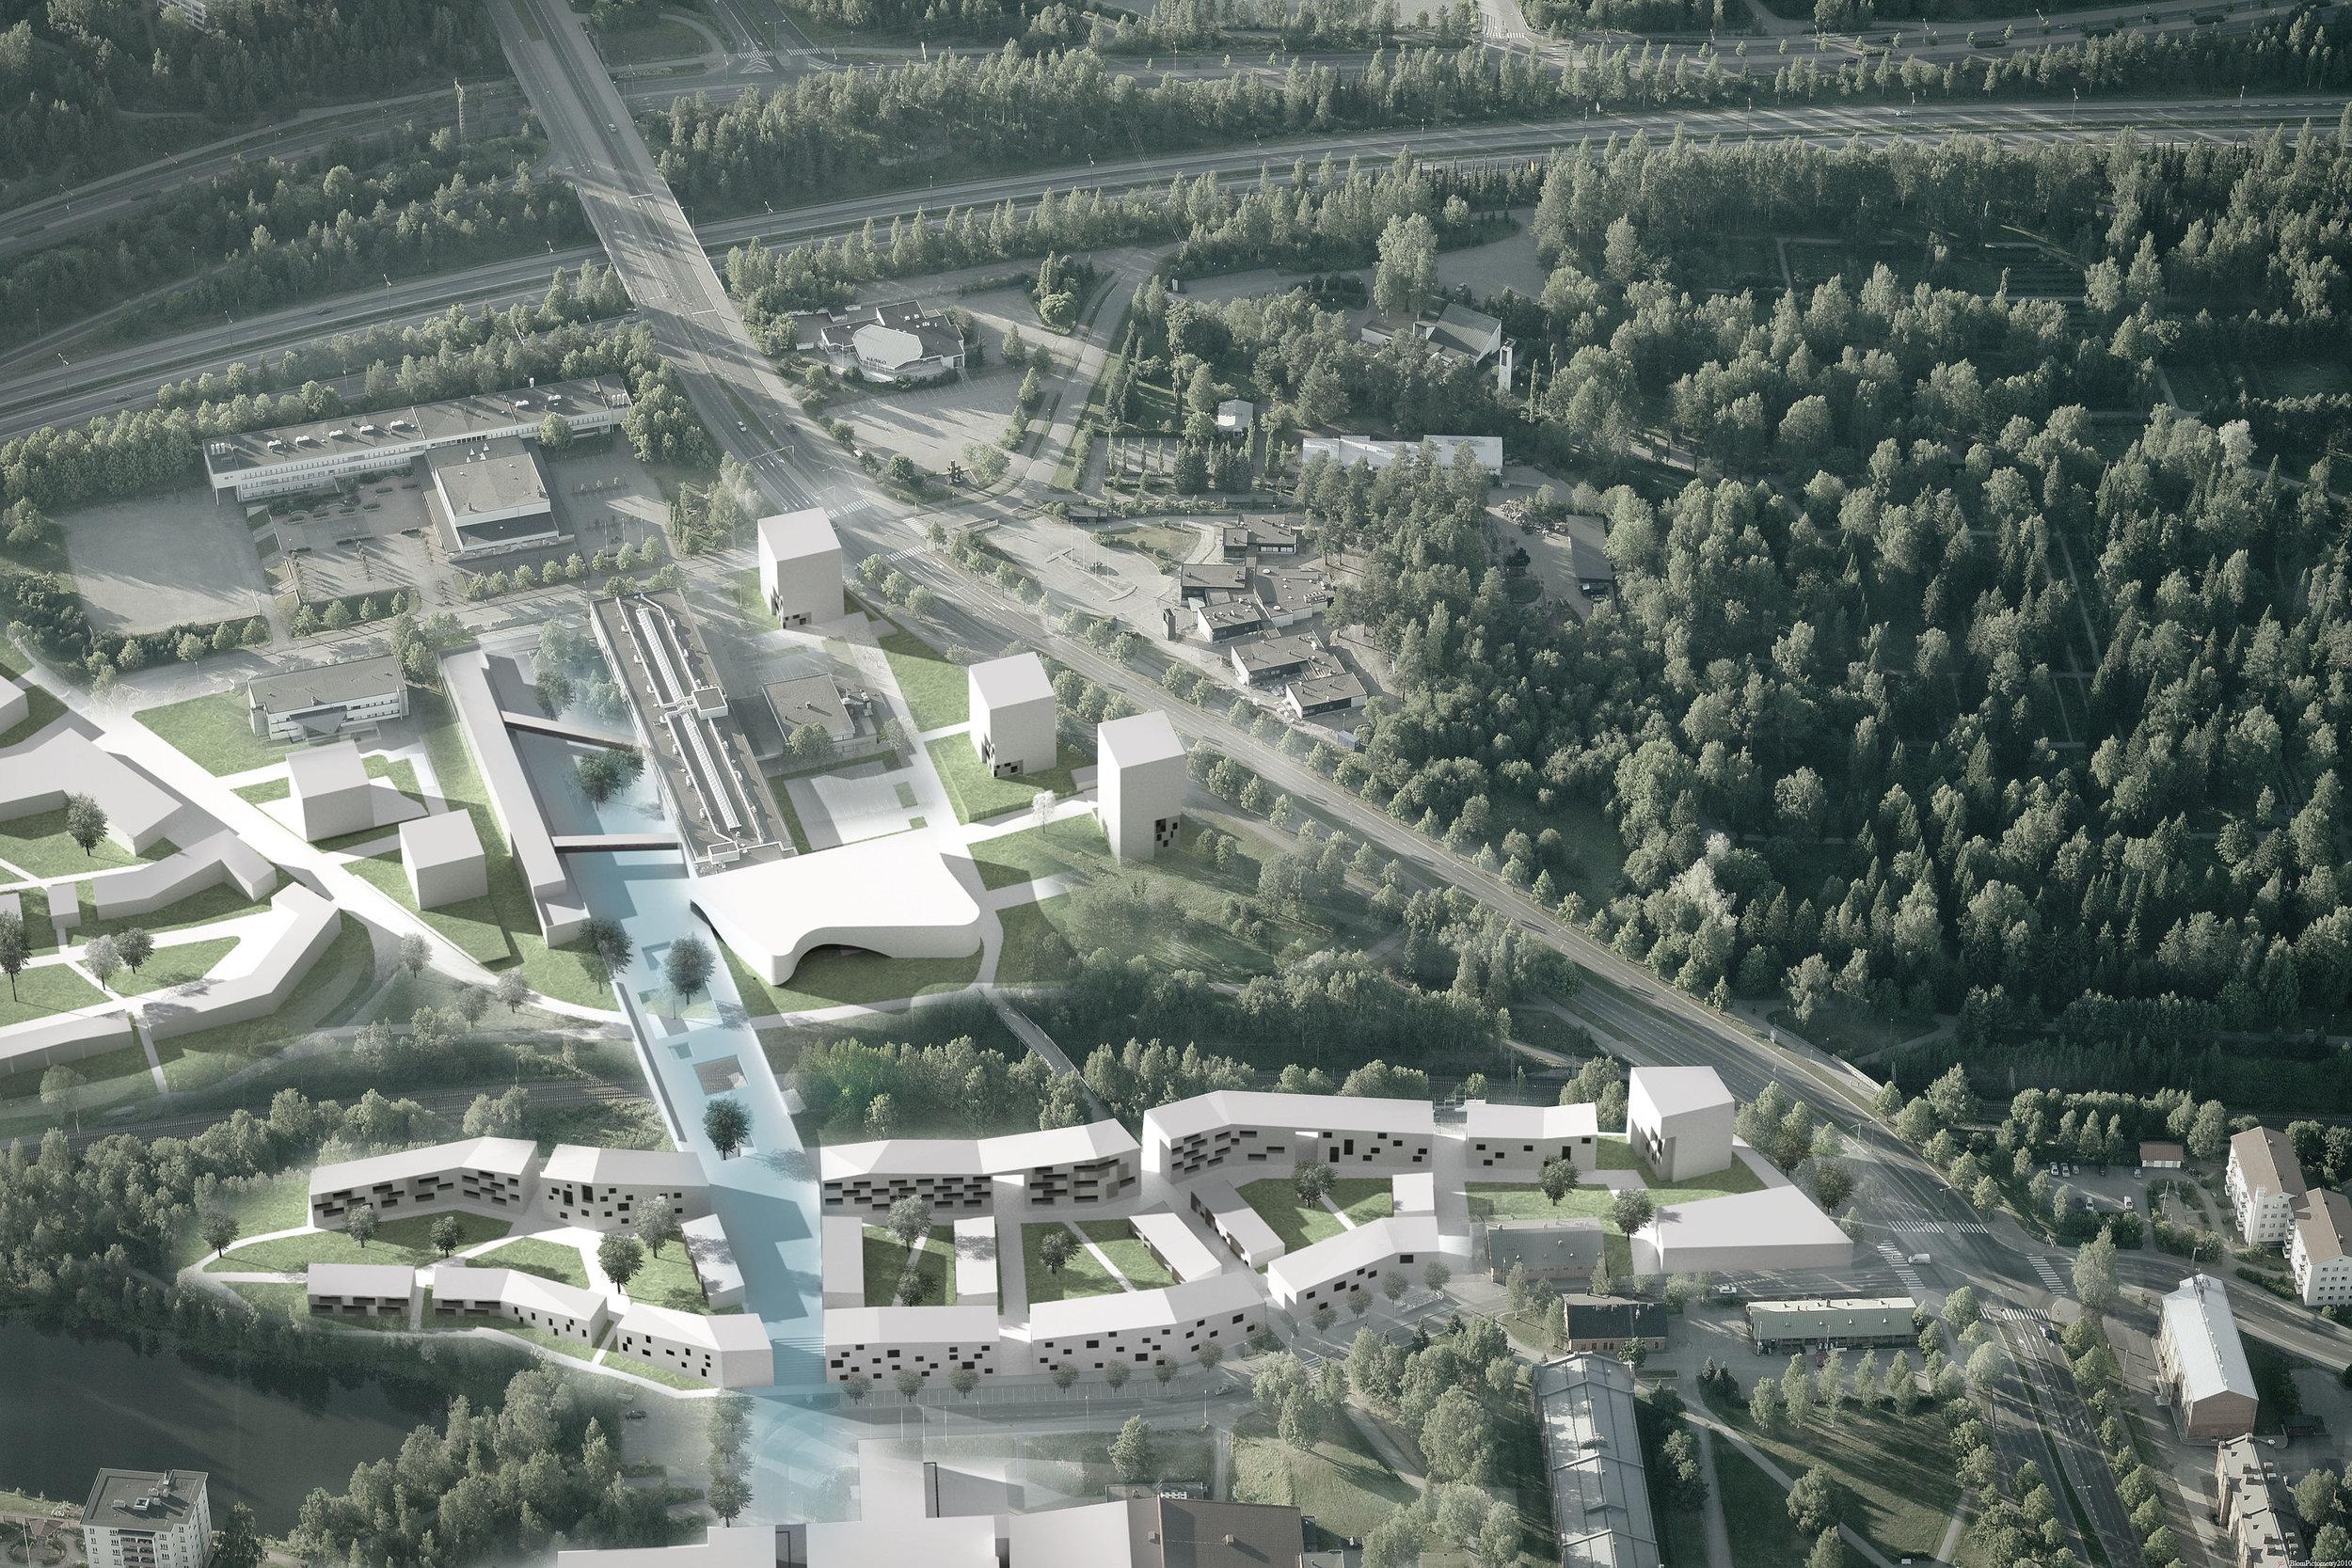 Anssi Lauttia, Kuutti Halinen & Tuomas Raikamo won the Europan 12, a competition of urban planning for young architects, in 2013. Courtesy Anssi Lauttia